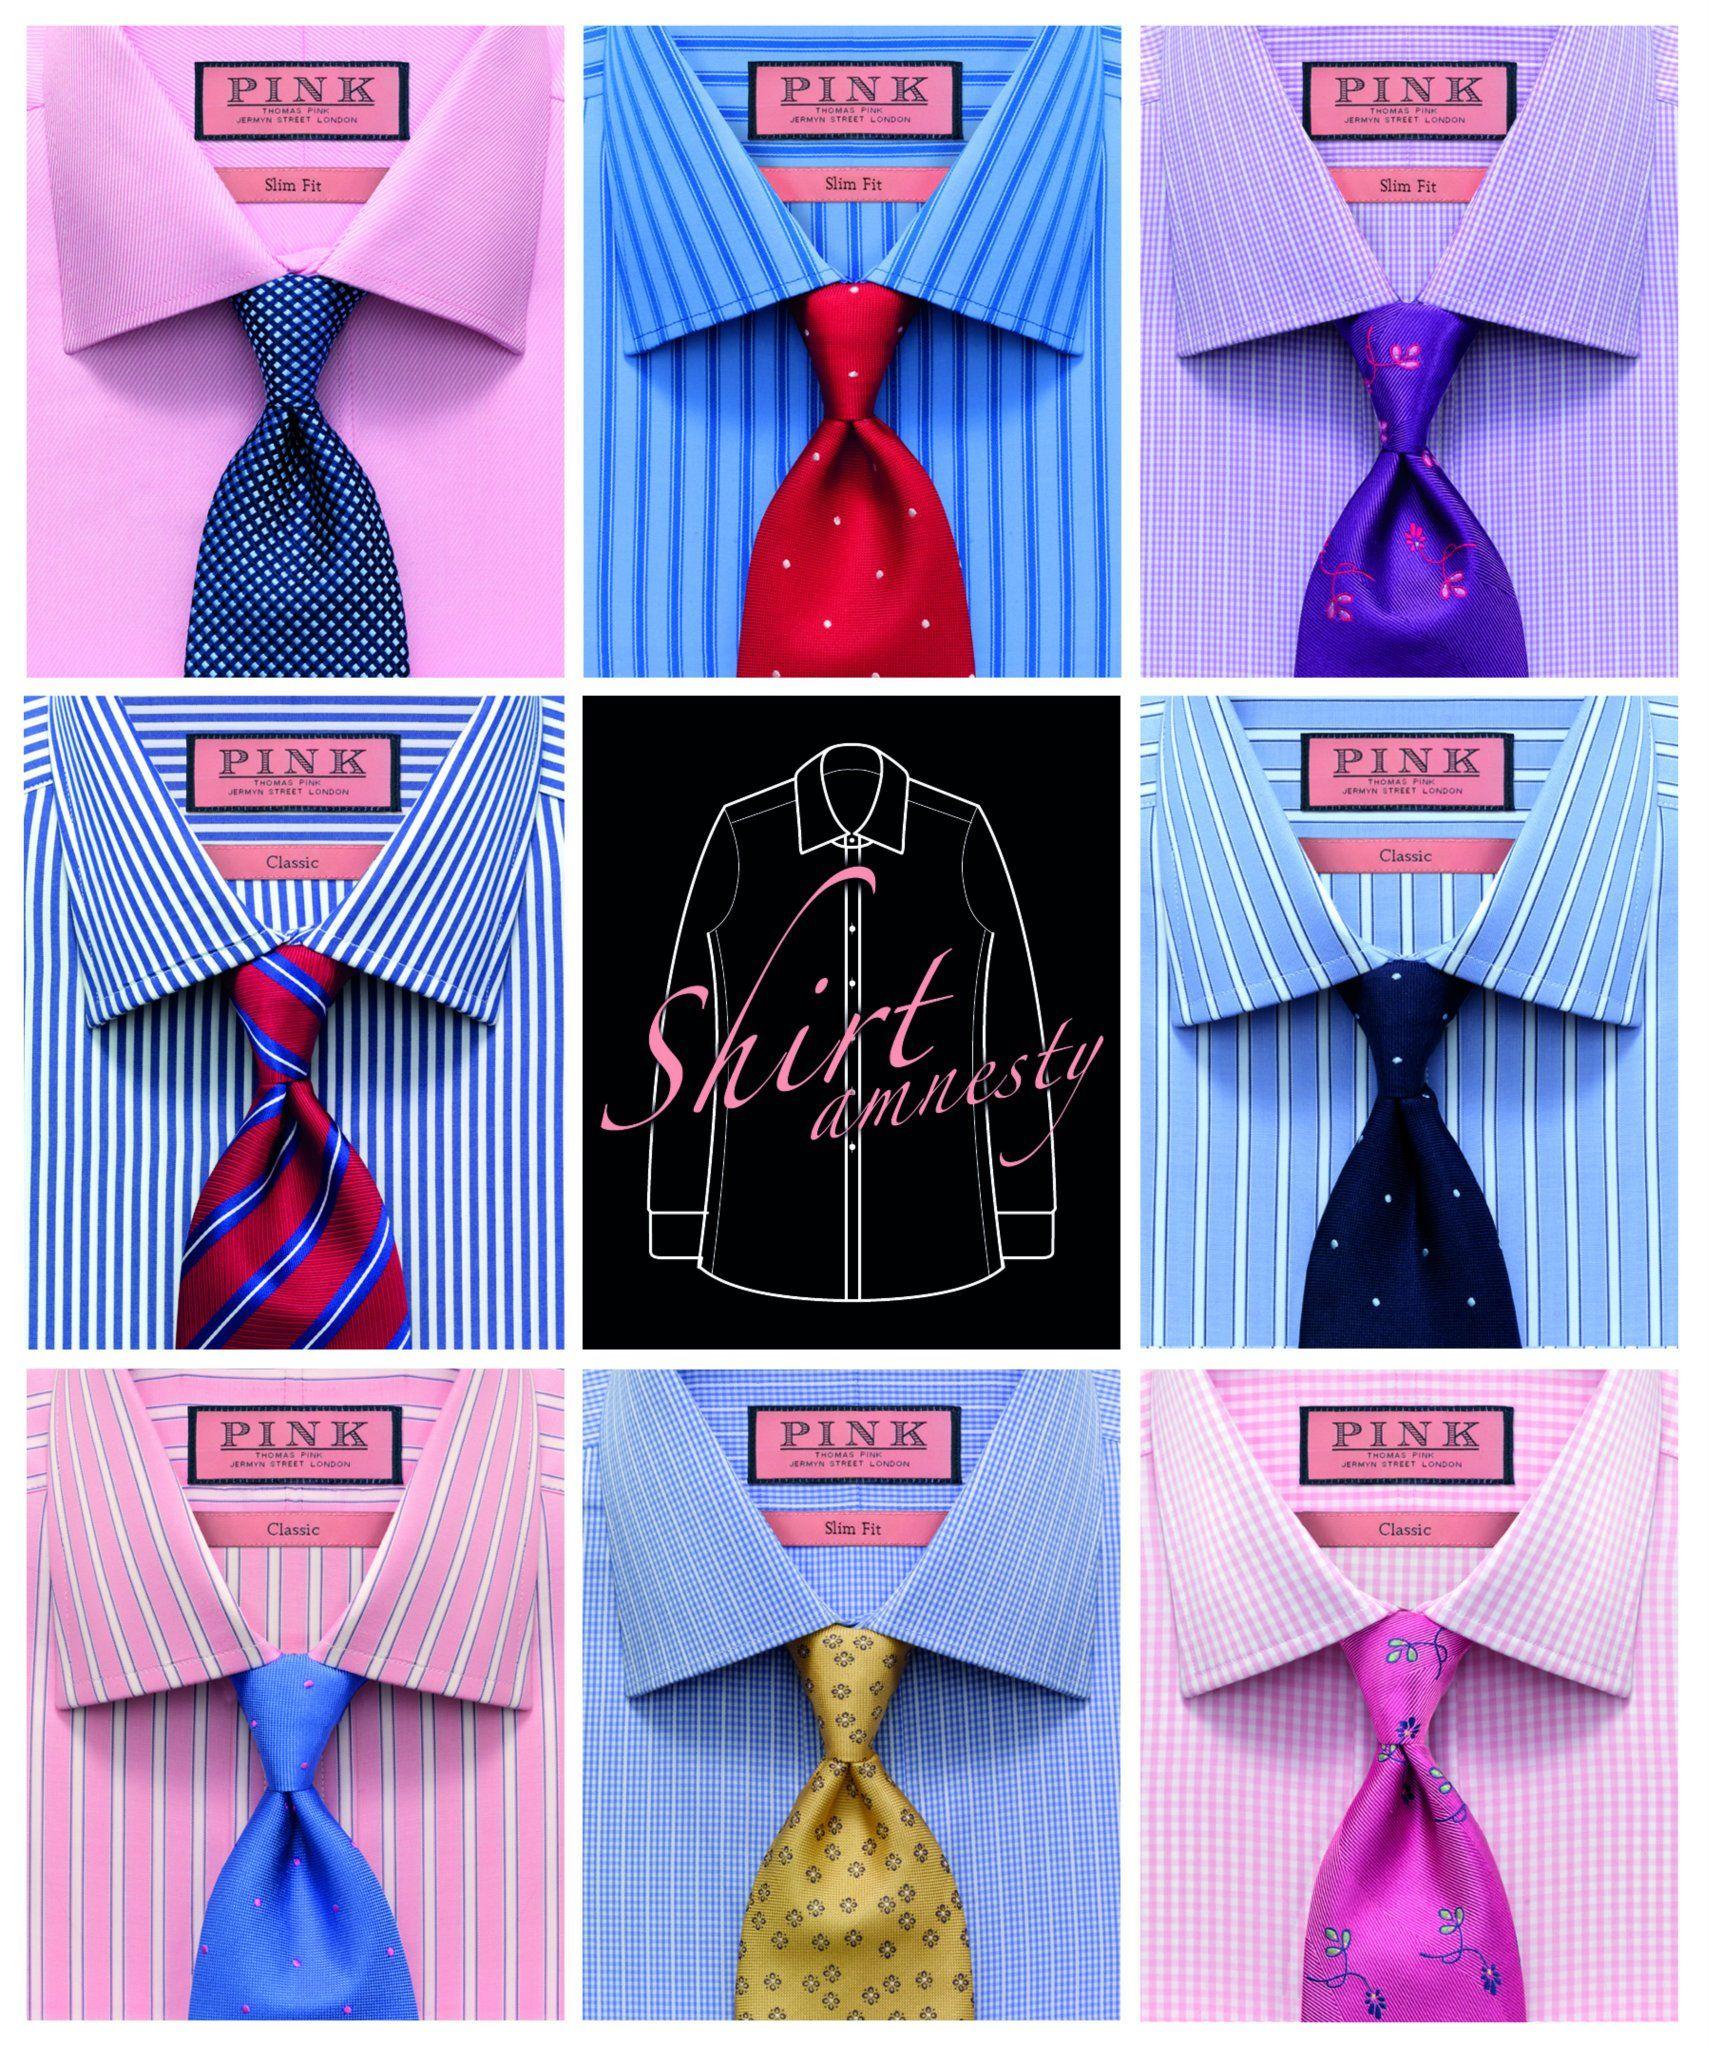 Pink dress shirt blue suit  Shirt envy  Thomas Pink  Pinterest  Shirt tie combo Thomas pink